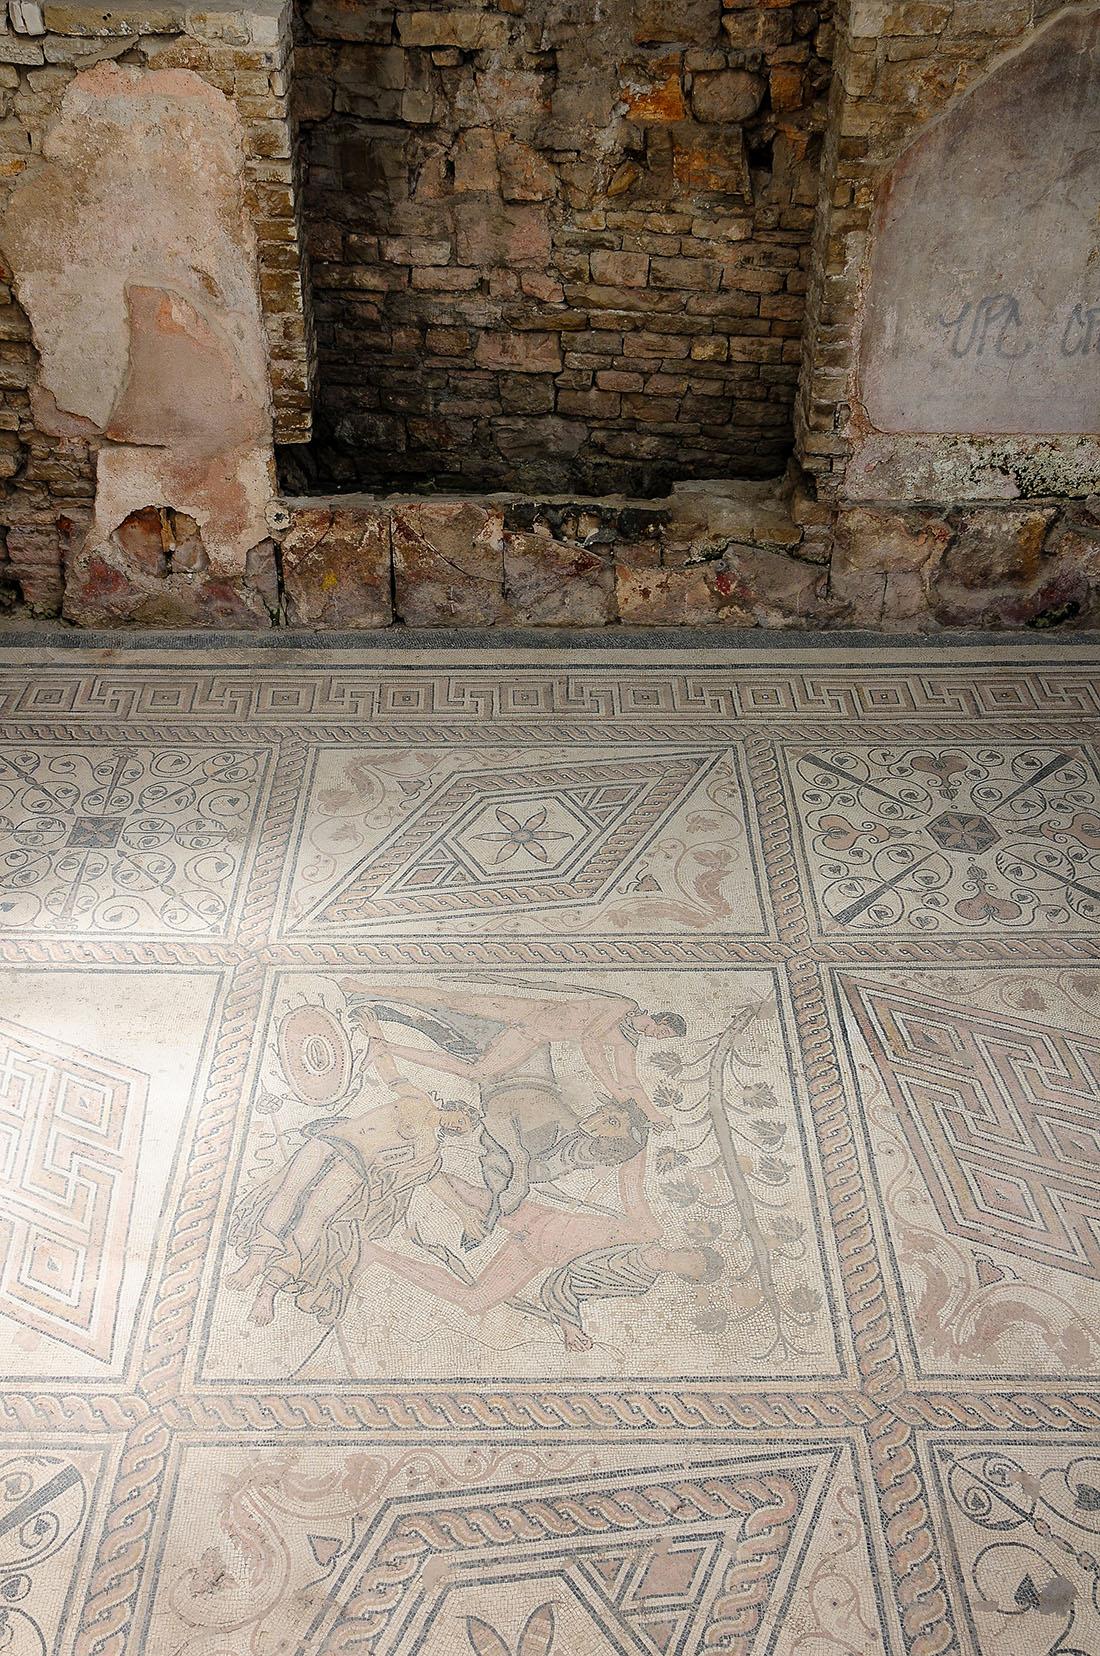 mosaïques romaines, Pula , road-trip en Croatie, Istrie